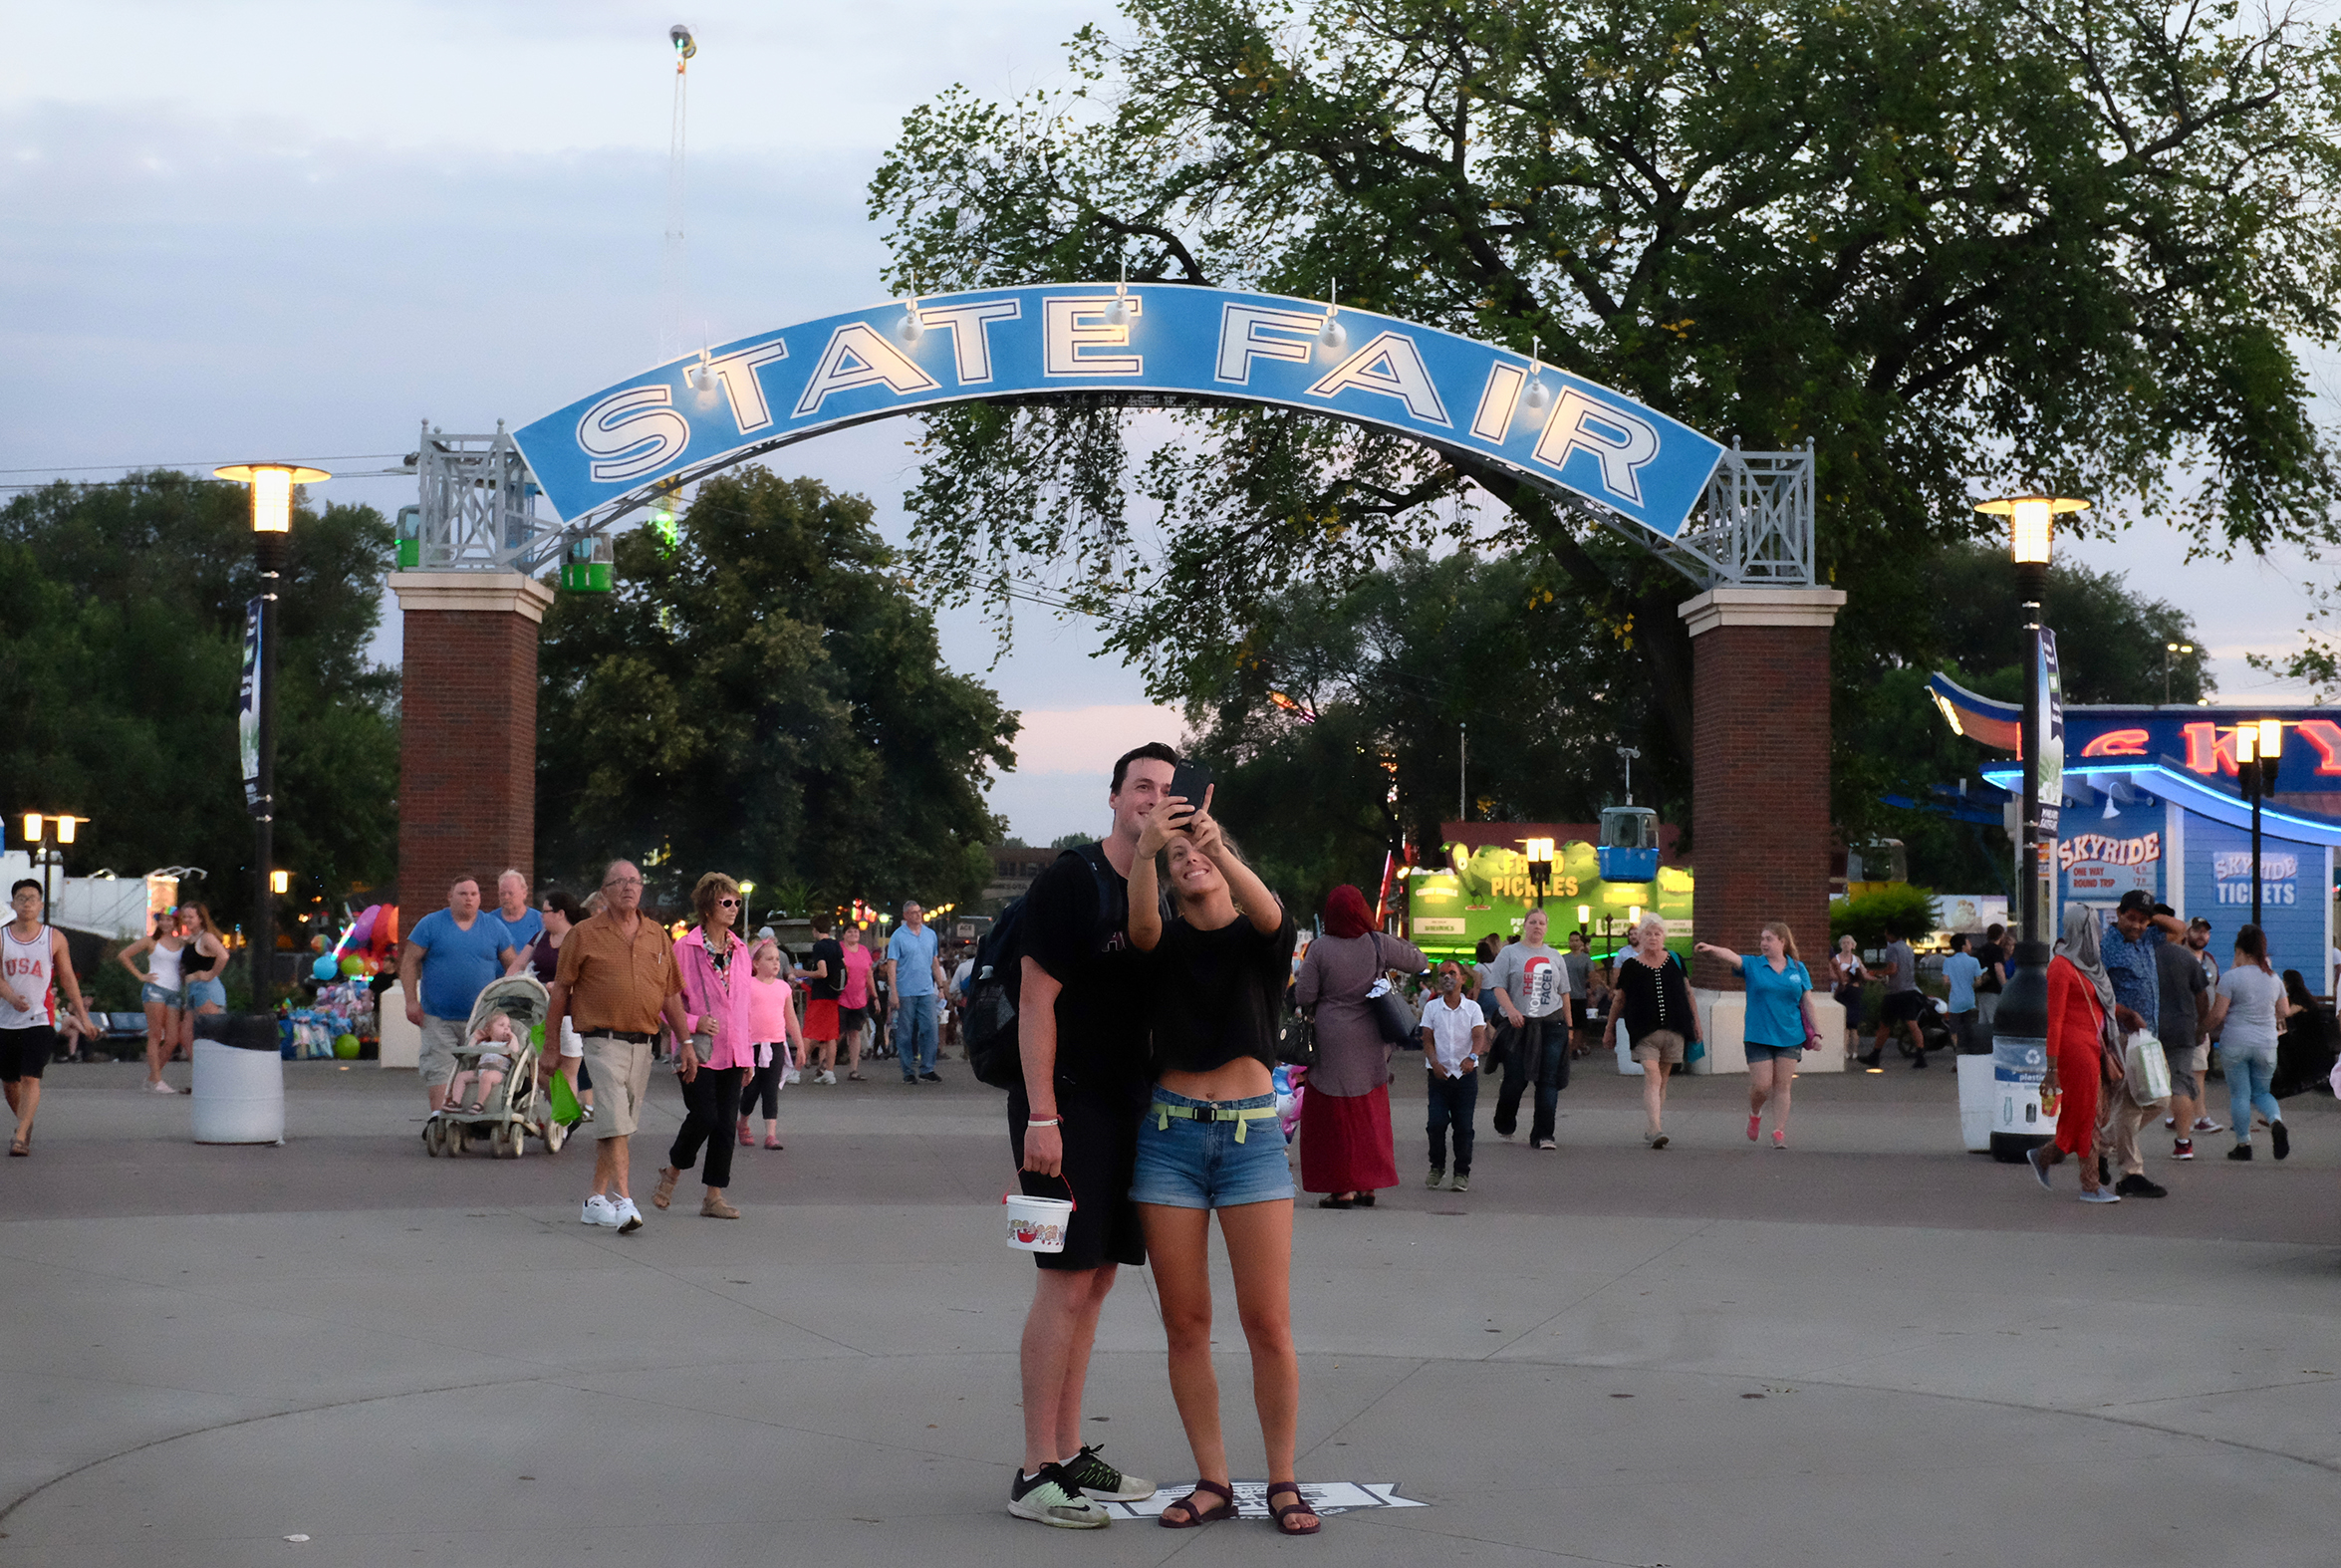 Photo courtesy of Minnesota State Fair.